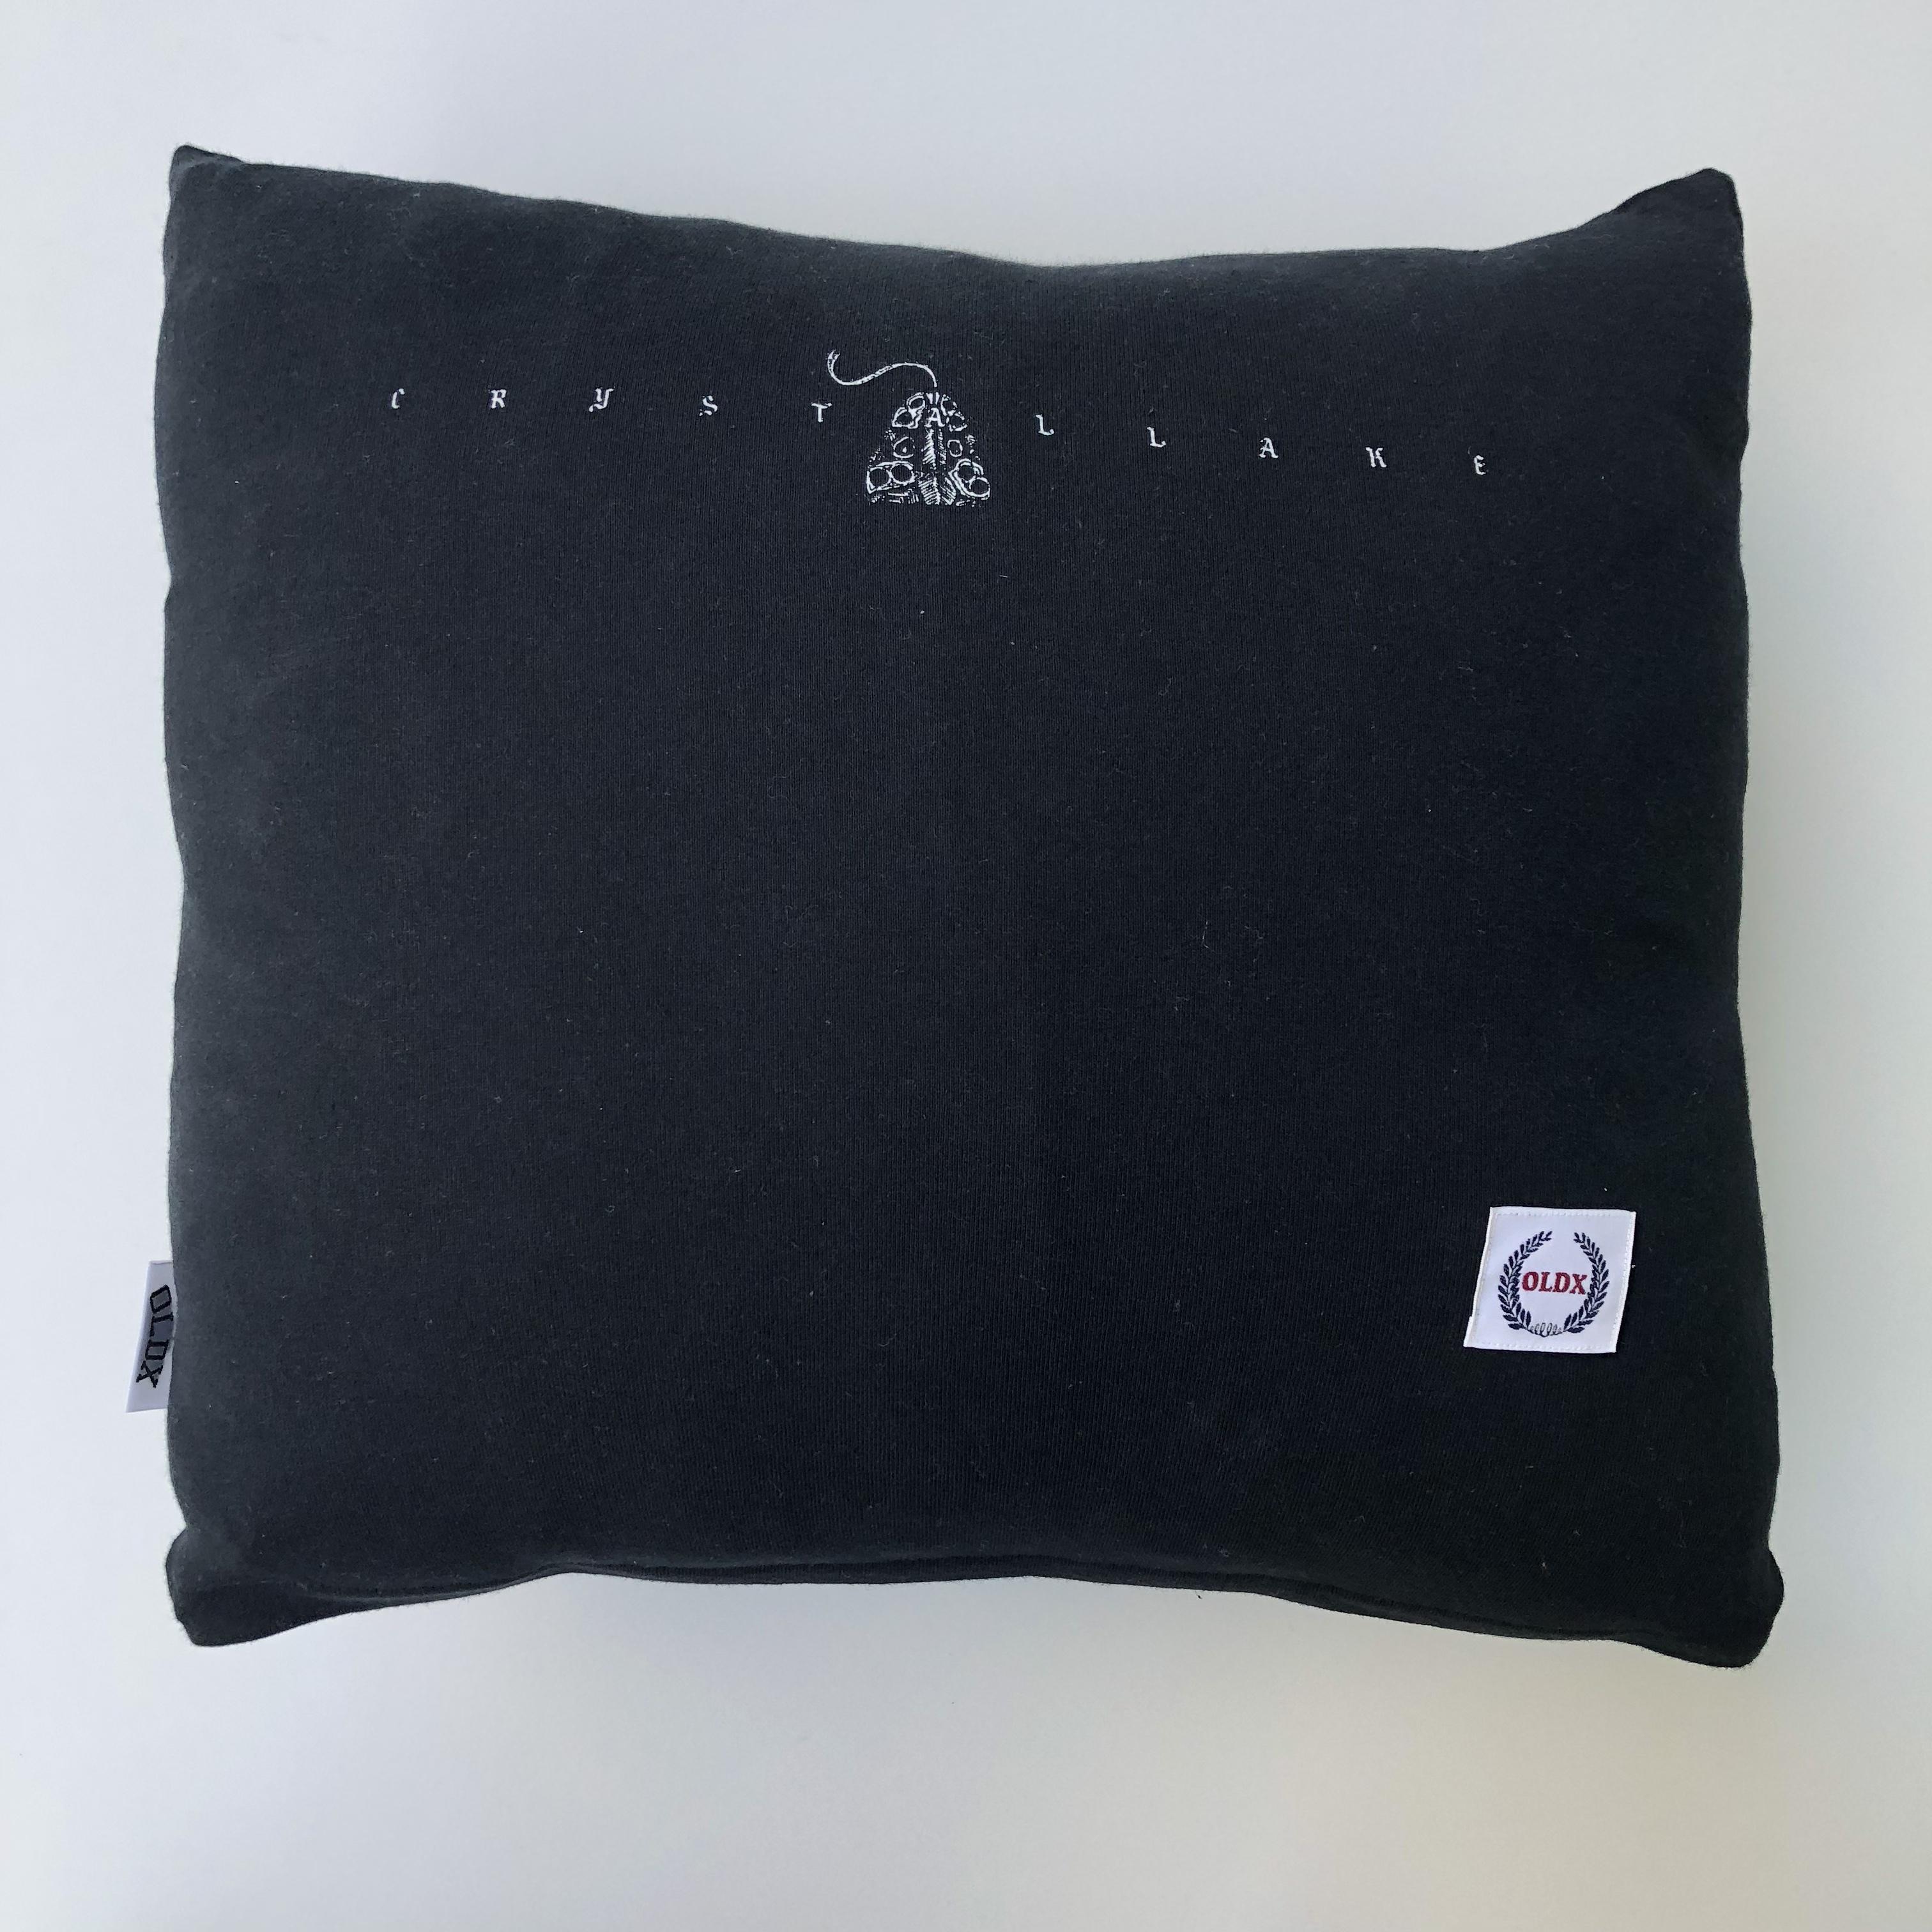 CRYSTAL LAKE x OLDX cushion Type-B